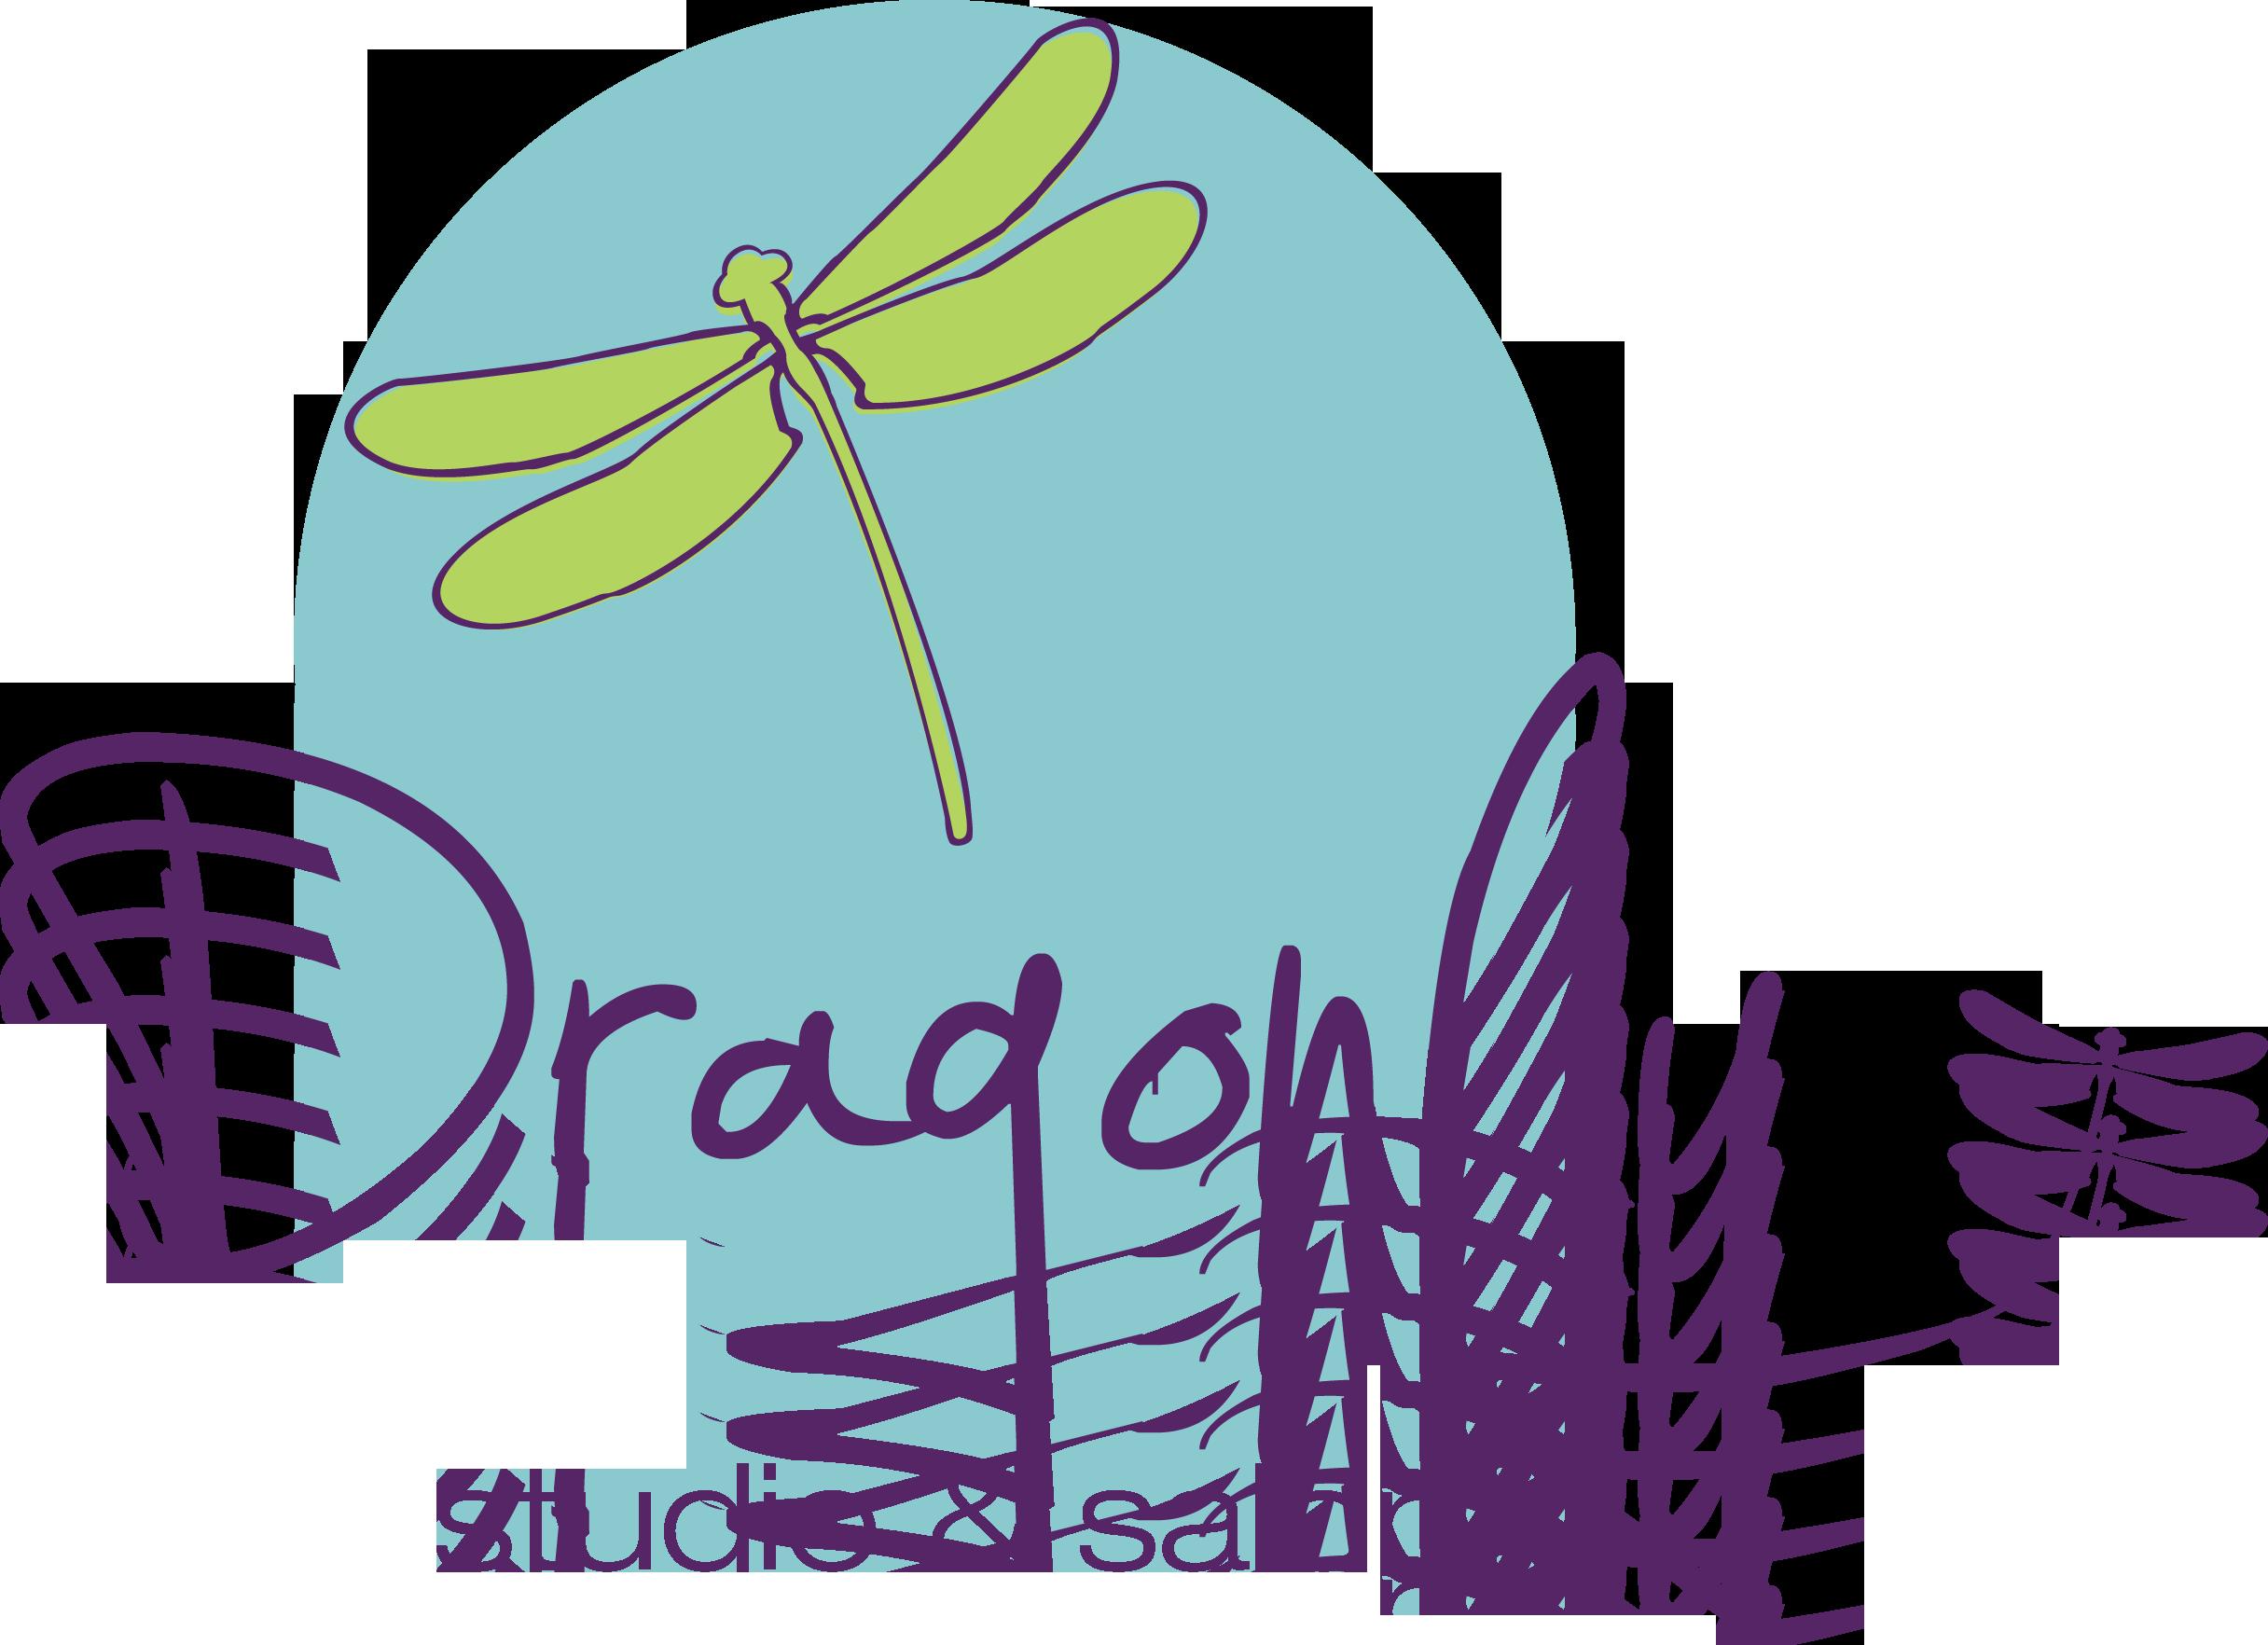 www.dragonflystudioandspa.com